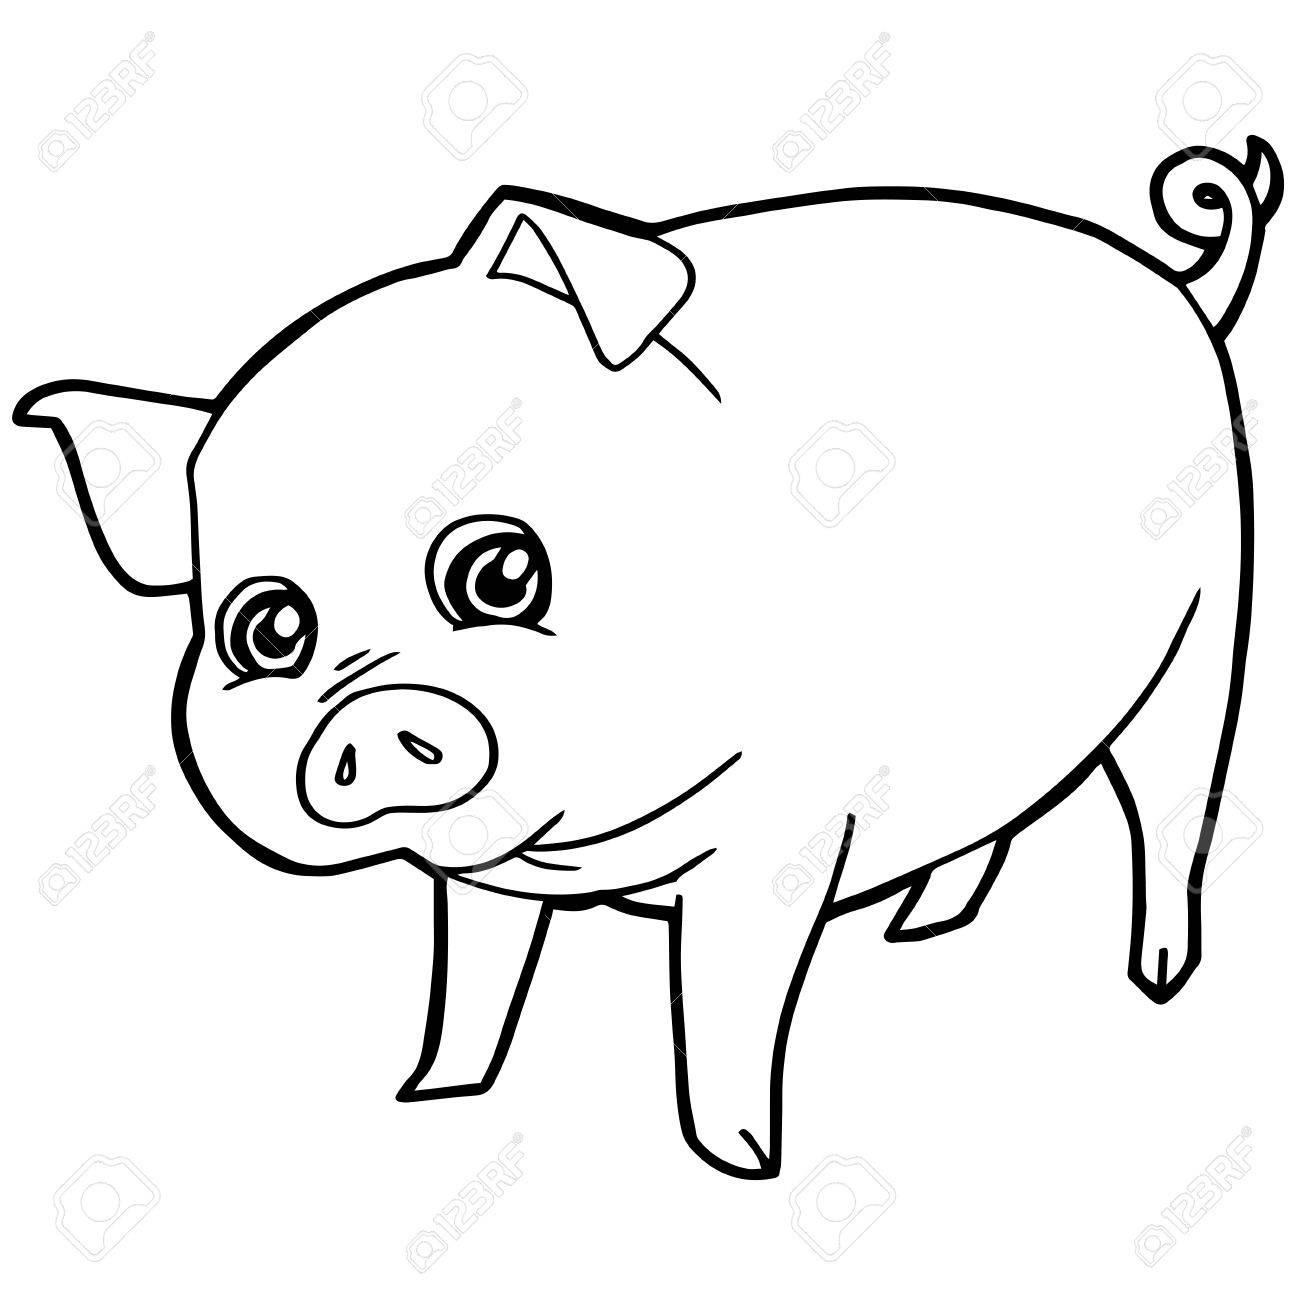 Dessin Animé Mignon Cochon Coloriage Page Illustration concernant Dessin A Colorier Cochon